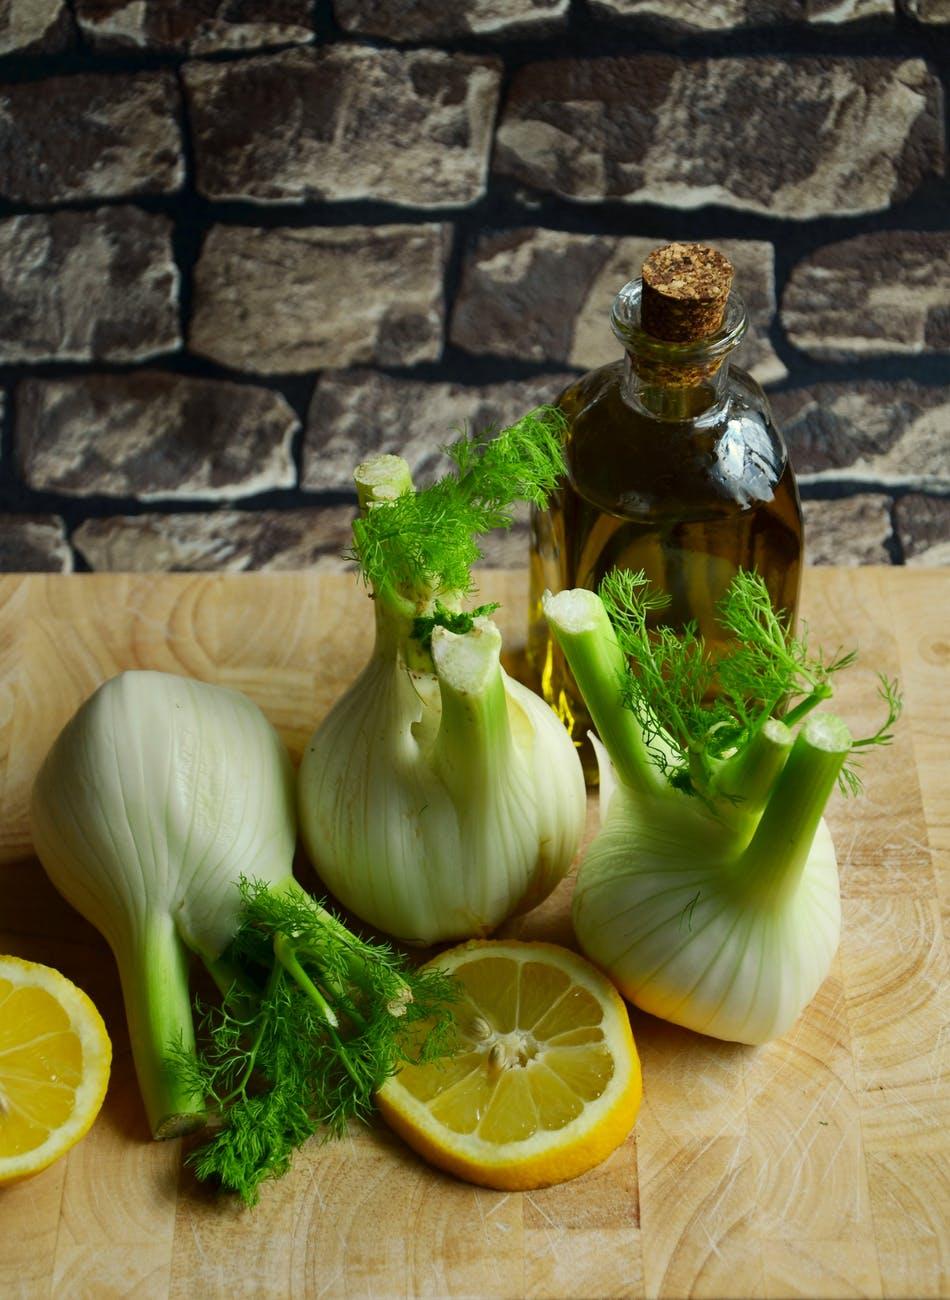 fennel vegetables fennel bulb food 159357